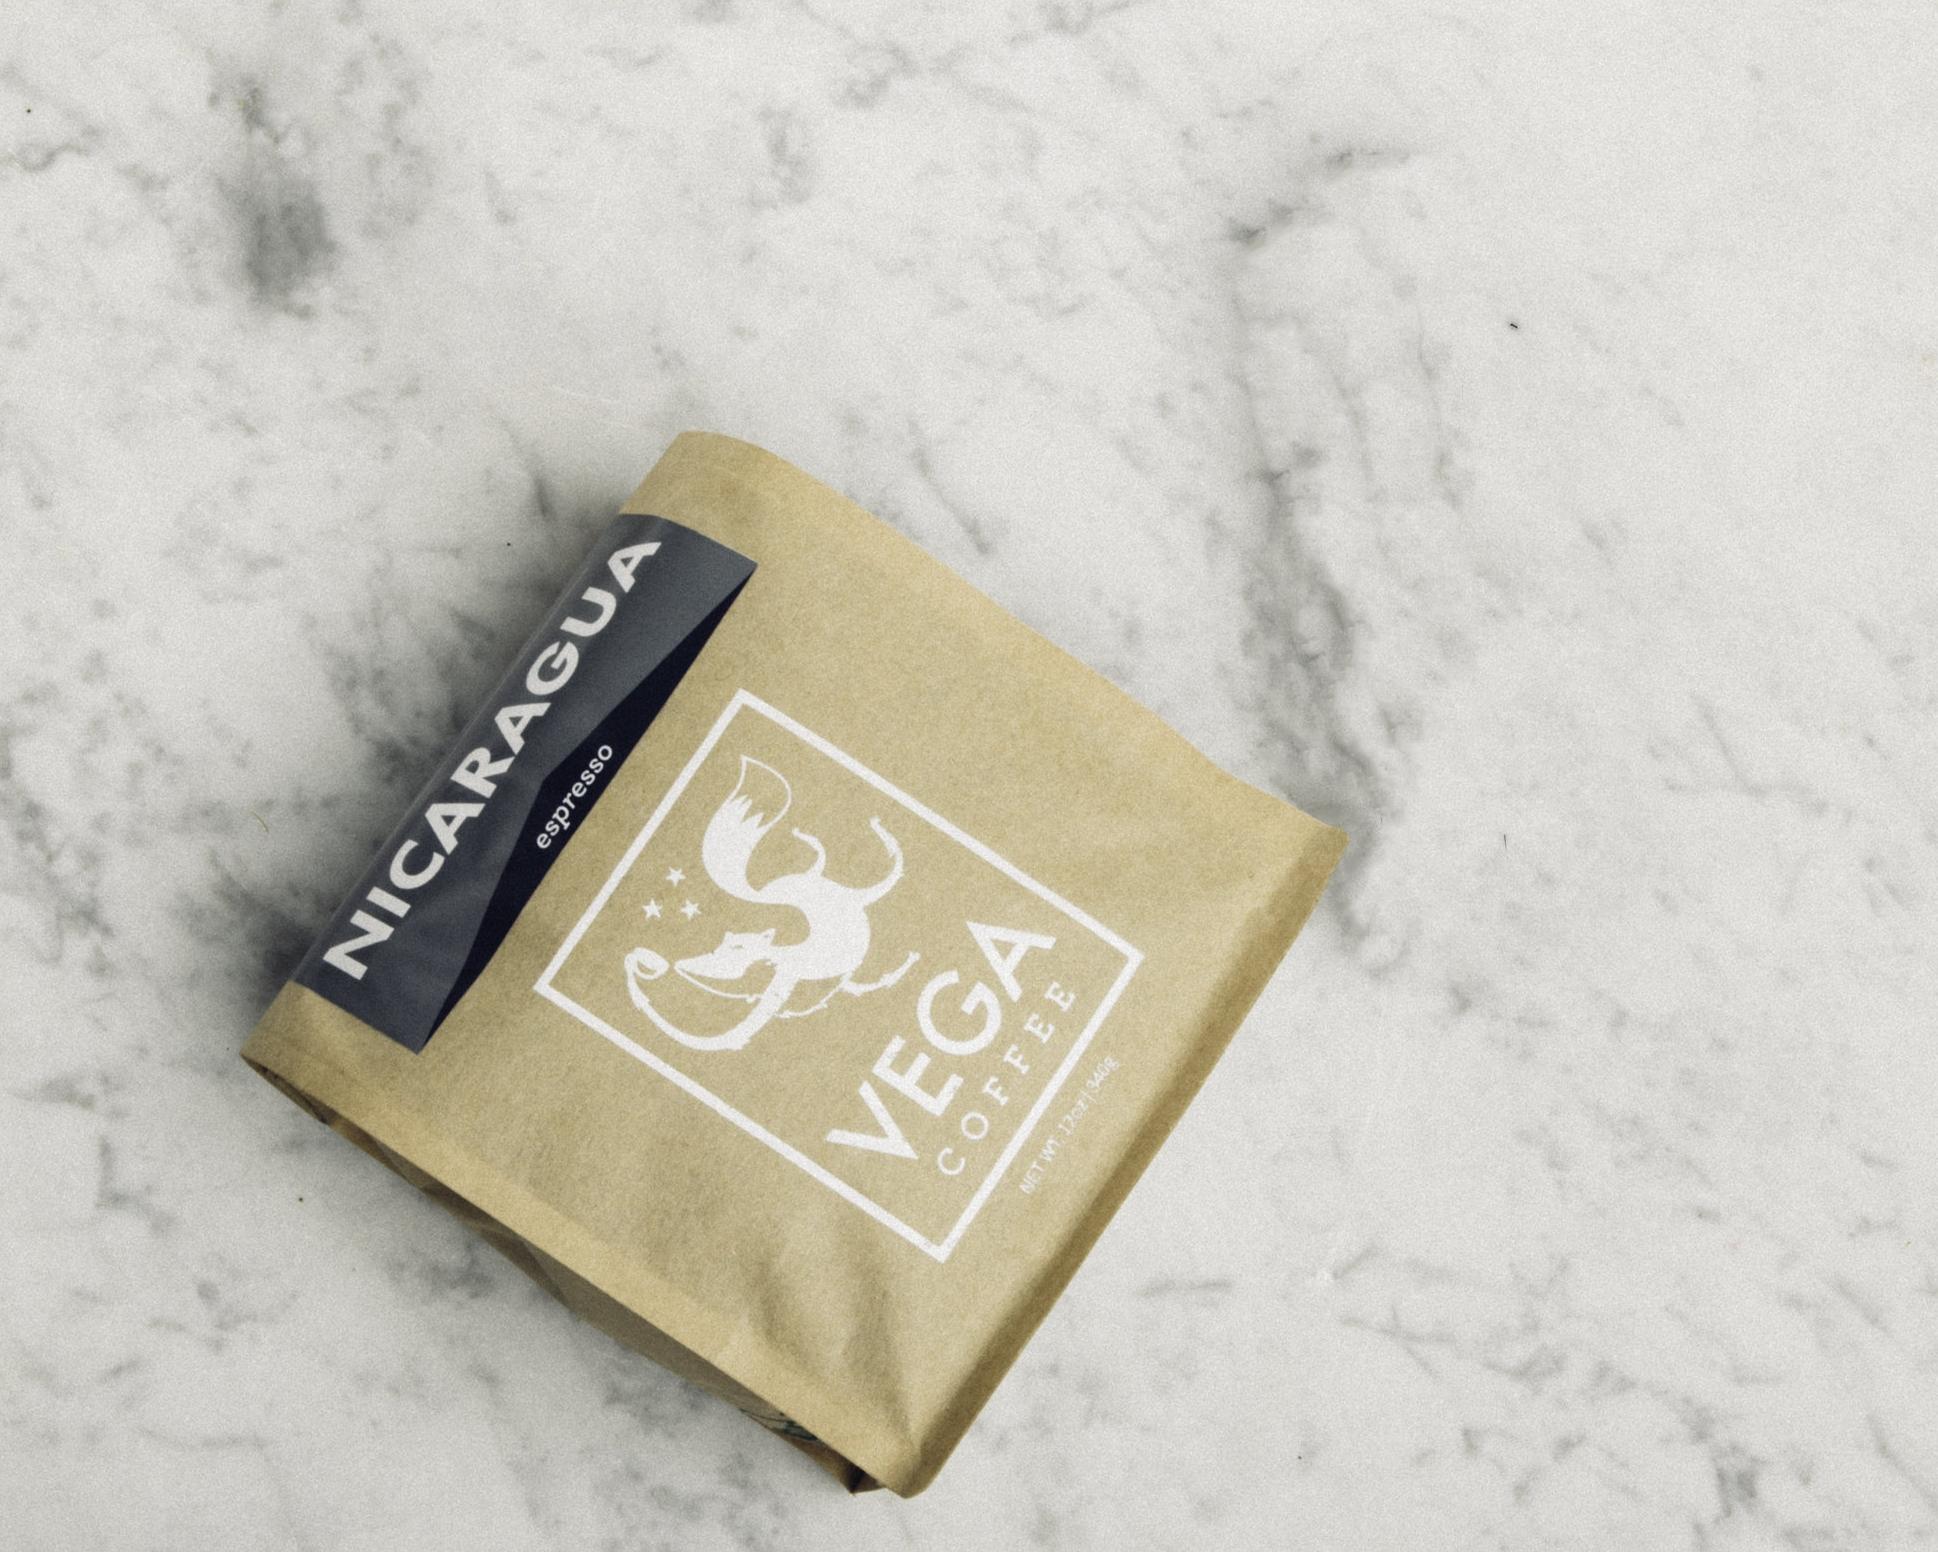 Vega Coffee, single-origin, fair-trade